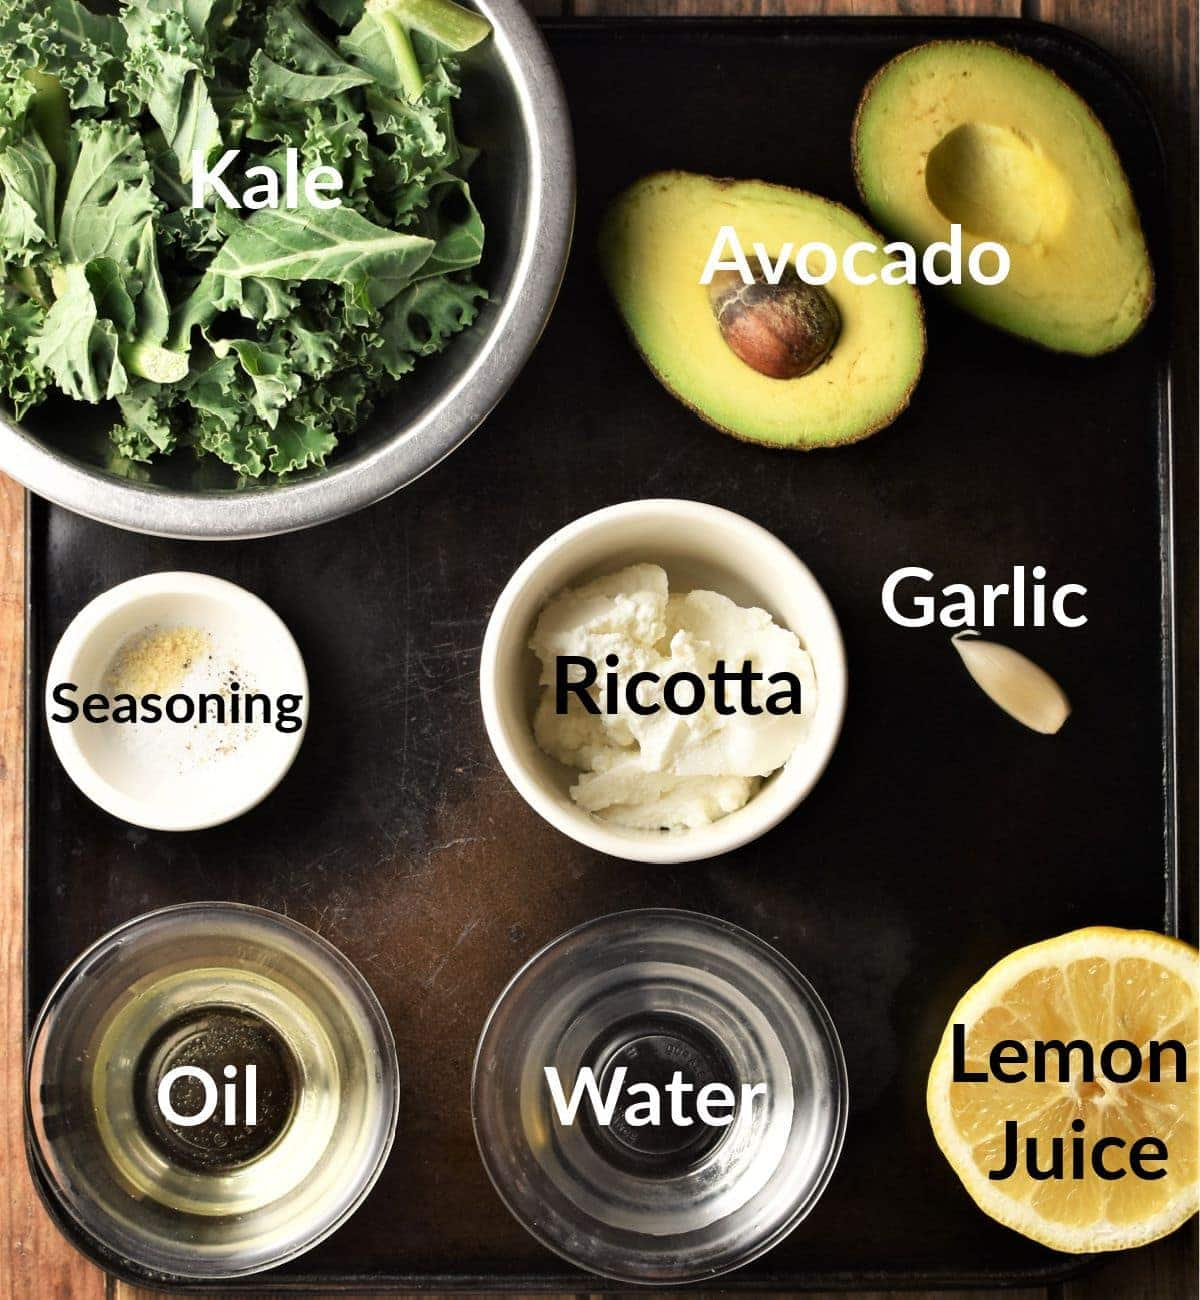 Kale dip ingredients in individual dishes.